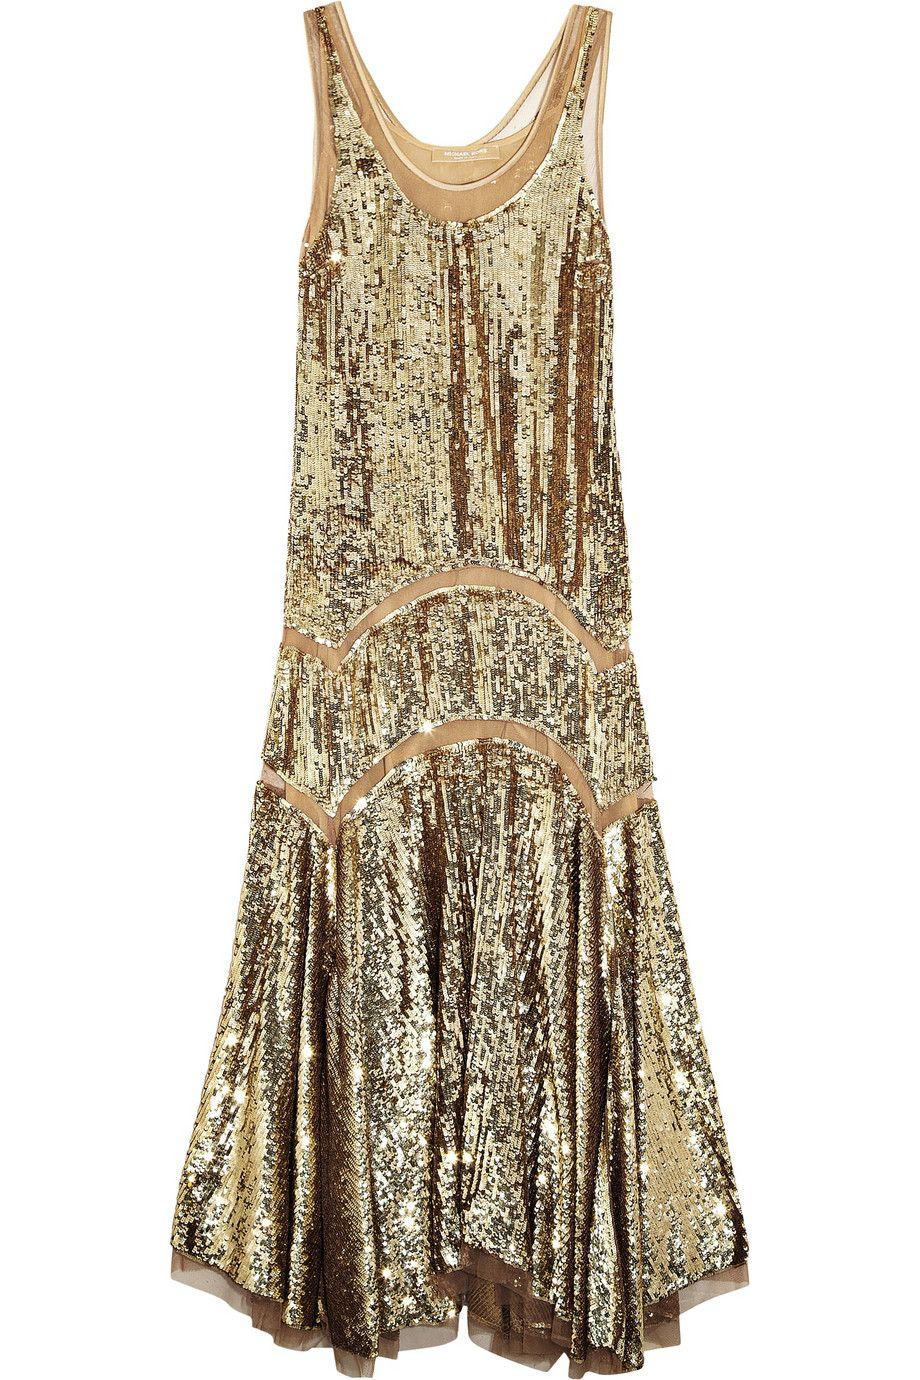 Michael kors sequined midi dress netaportercom my style